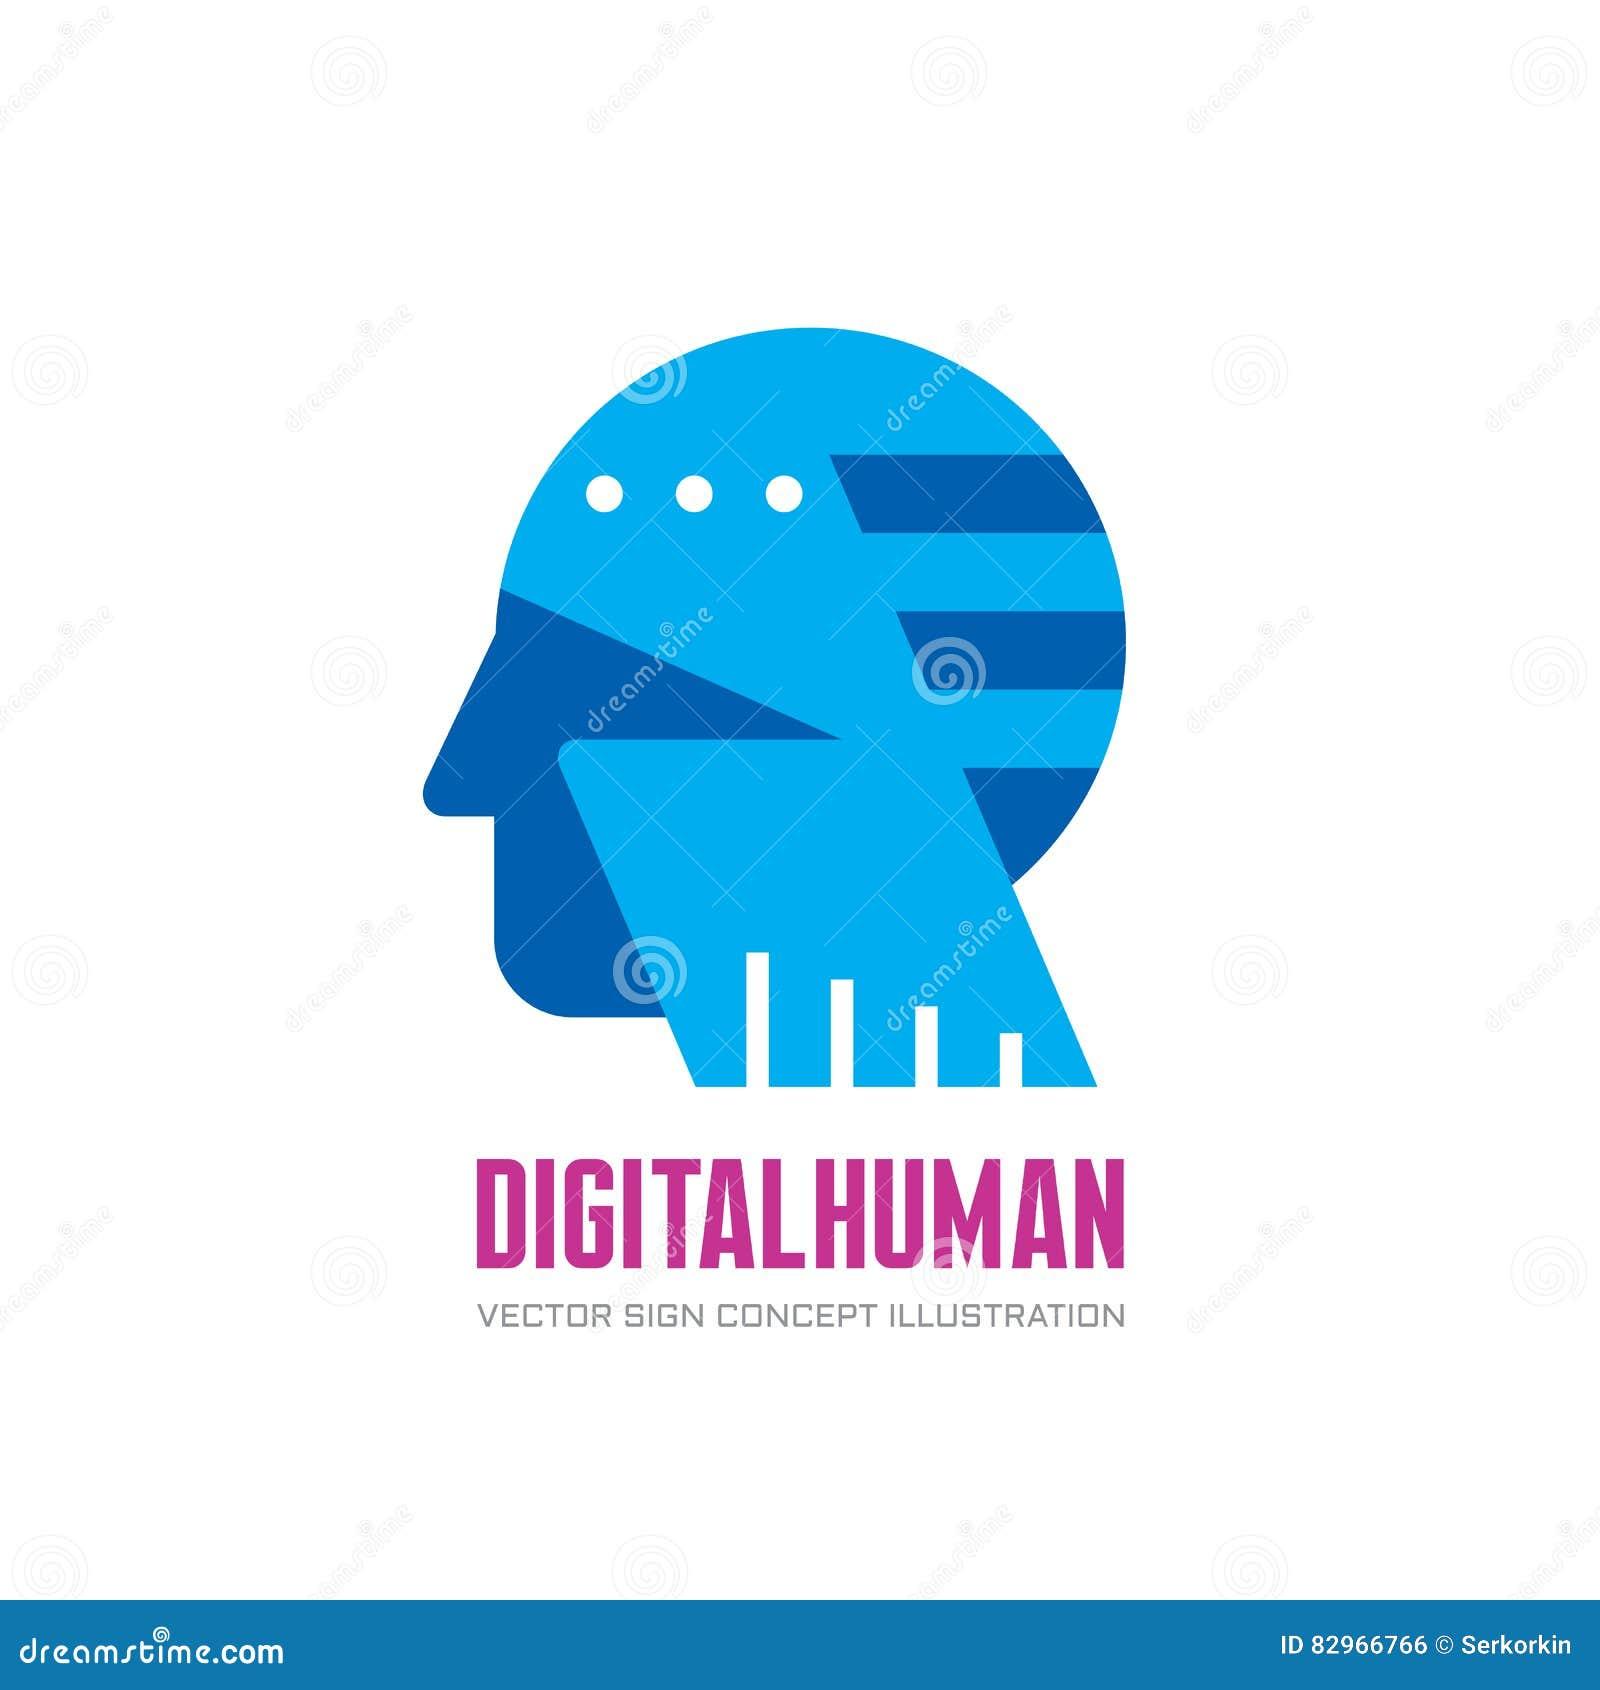 Digital human head vector logo concept illustration. Creative idea sign. Learning icon. People computer chip. Innovation tech.